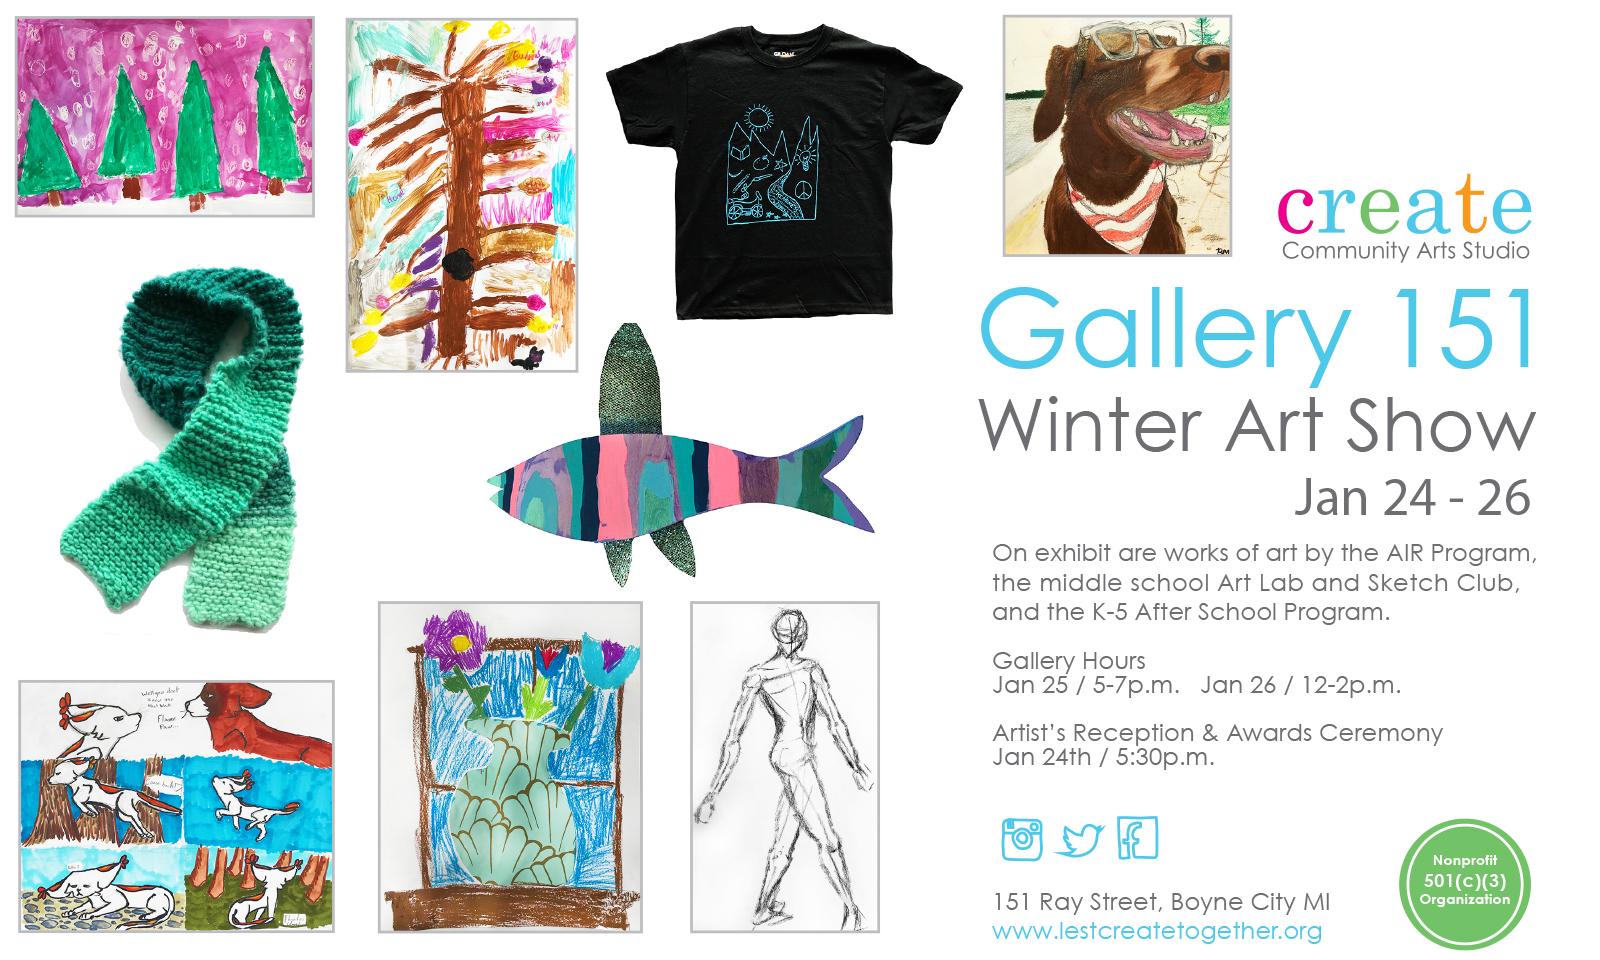 Gallery 151 Winter ARt Show.jpg